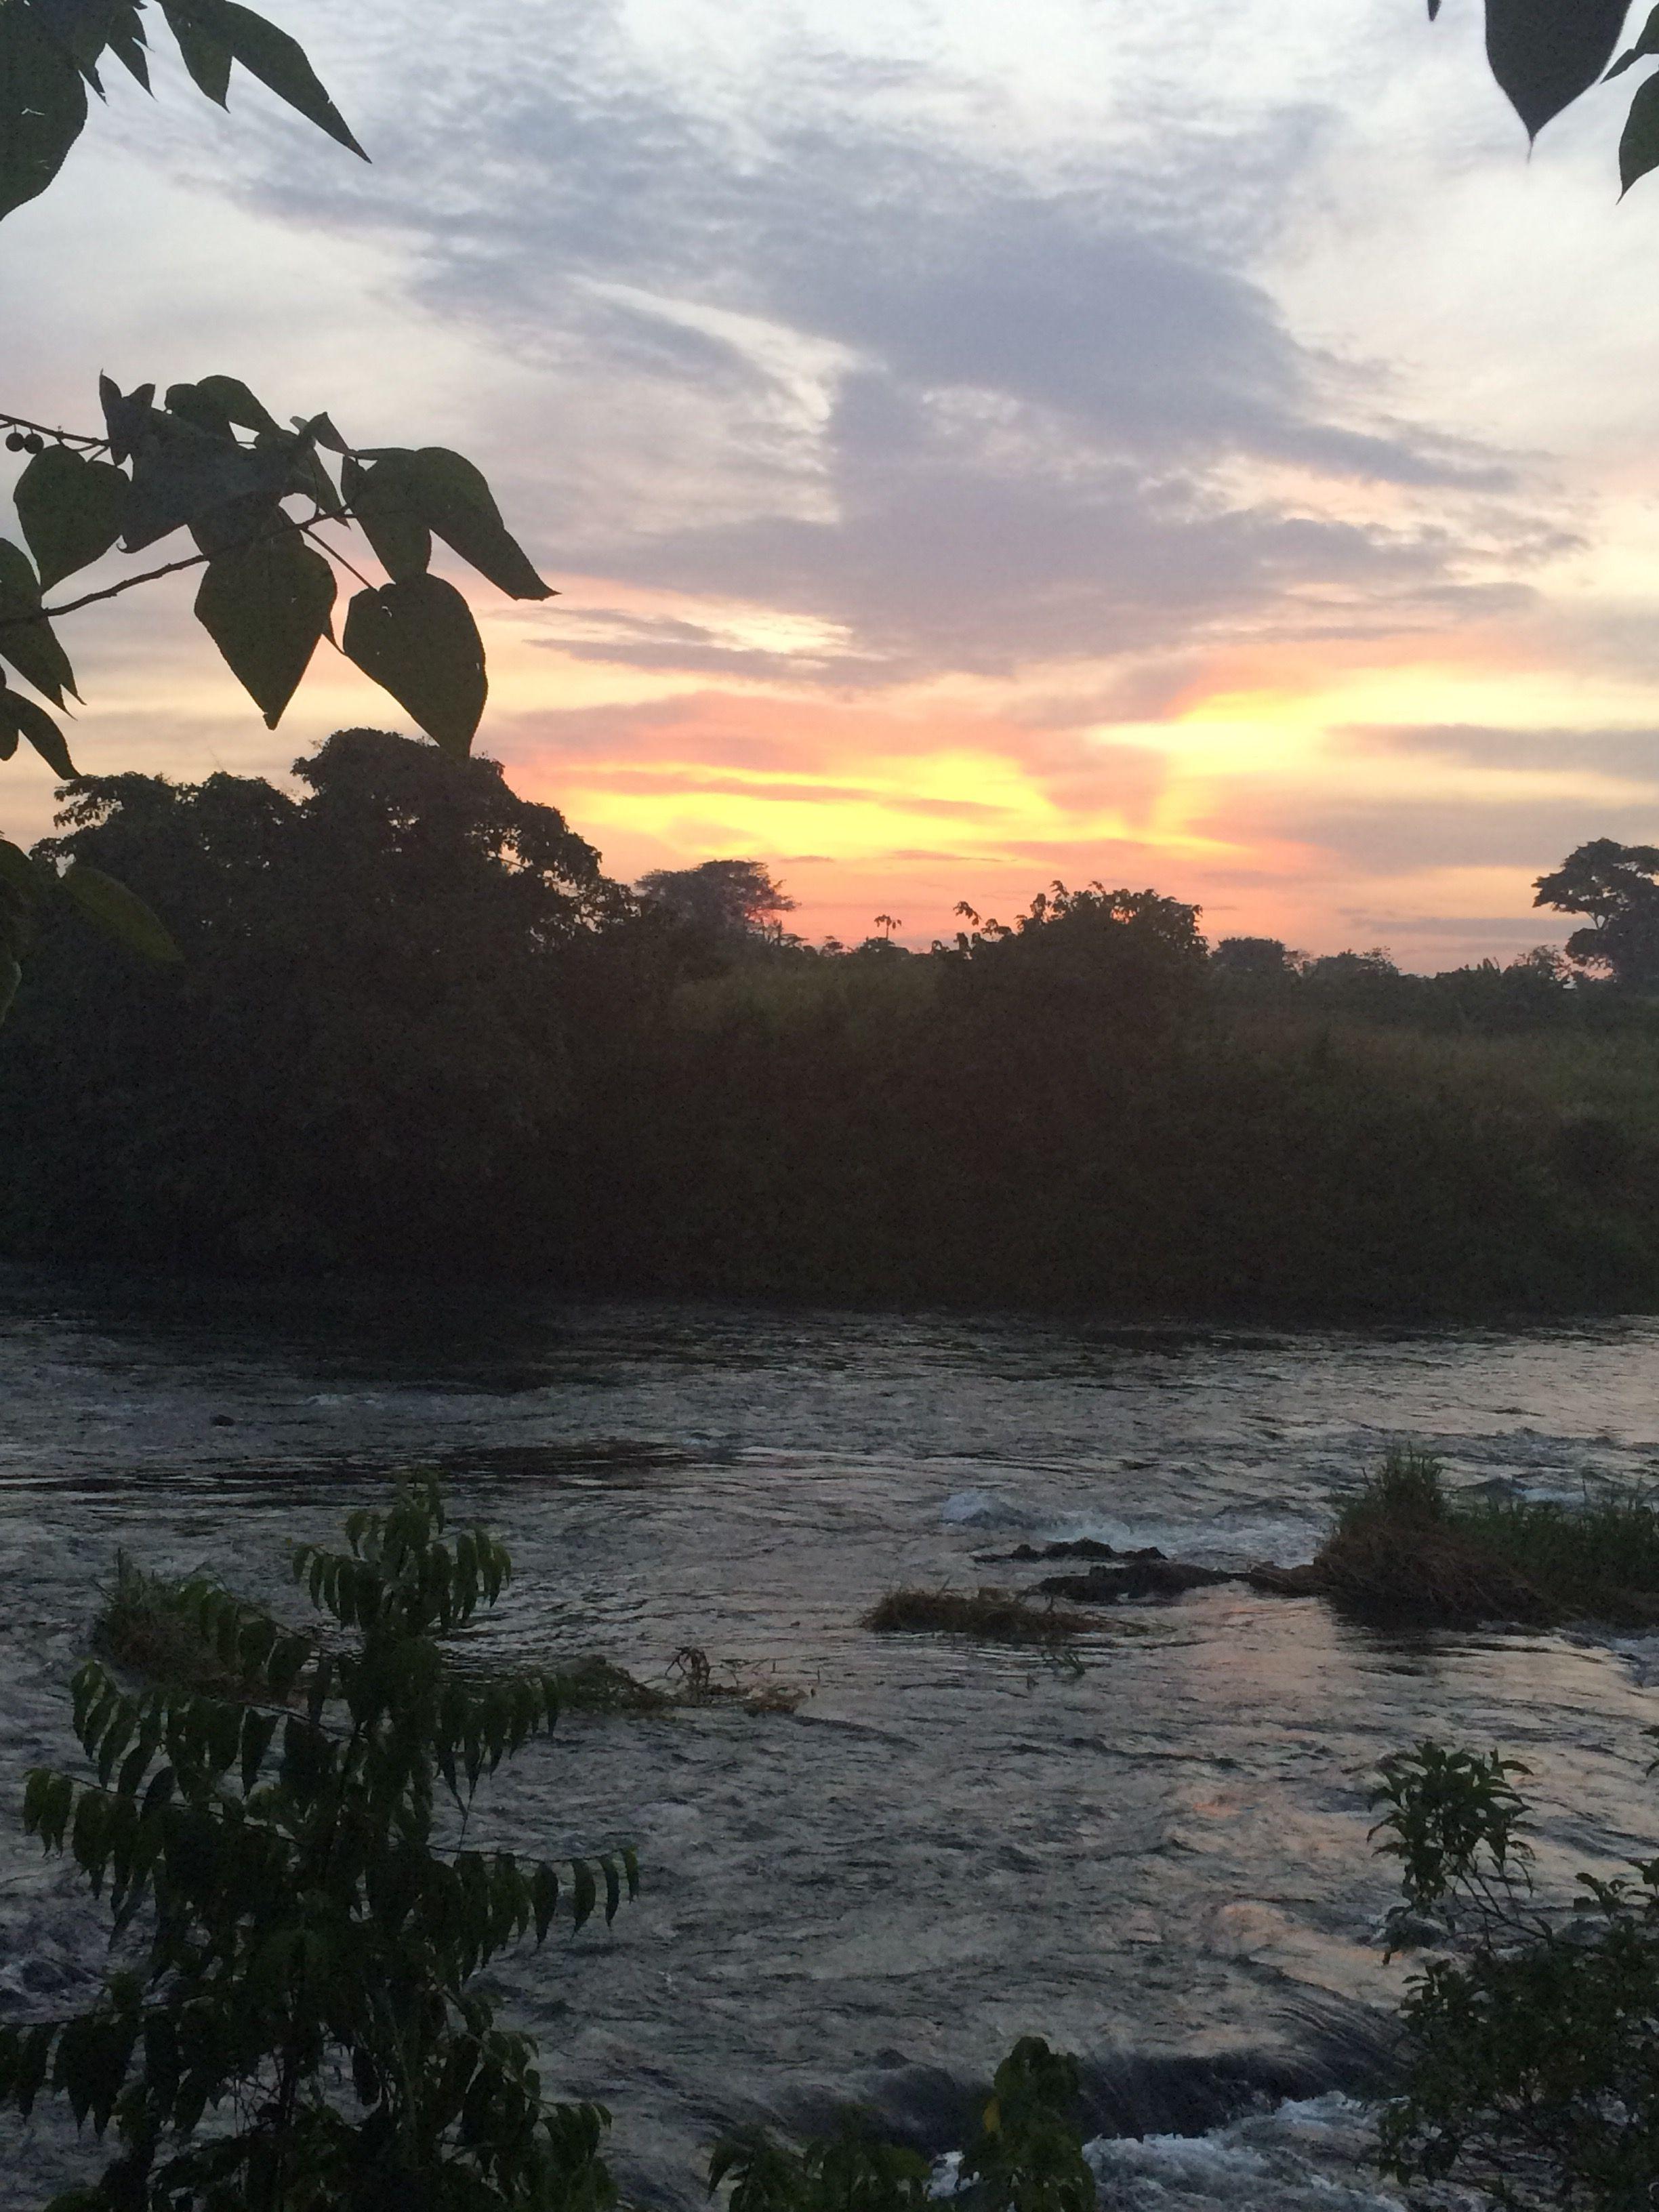 uganda jinja hairy lemon island east africa have a read of my